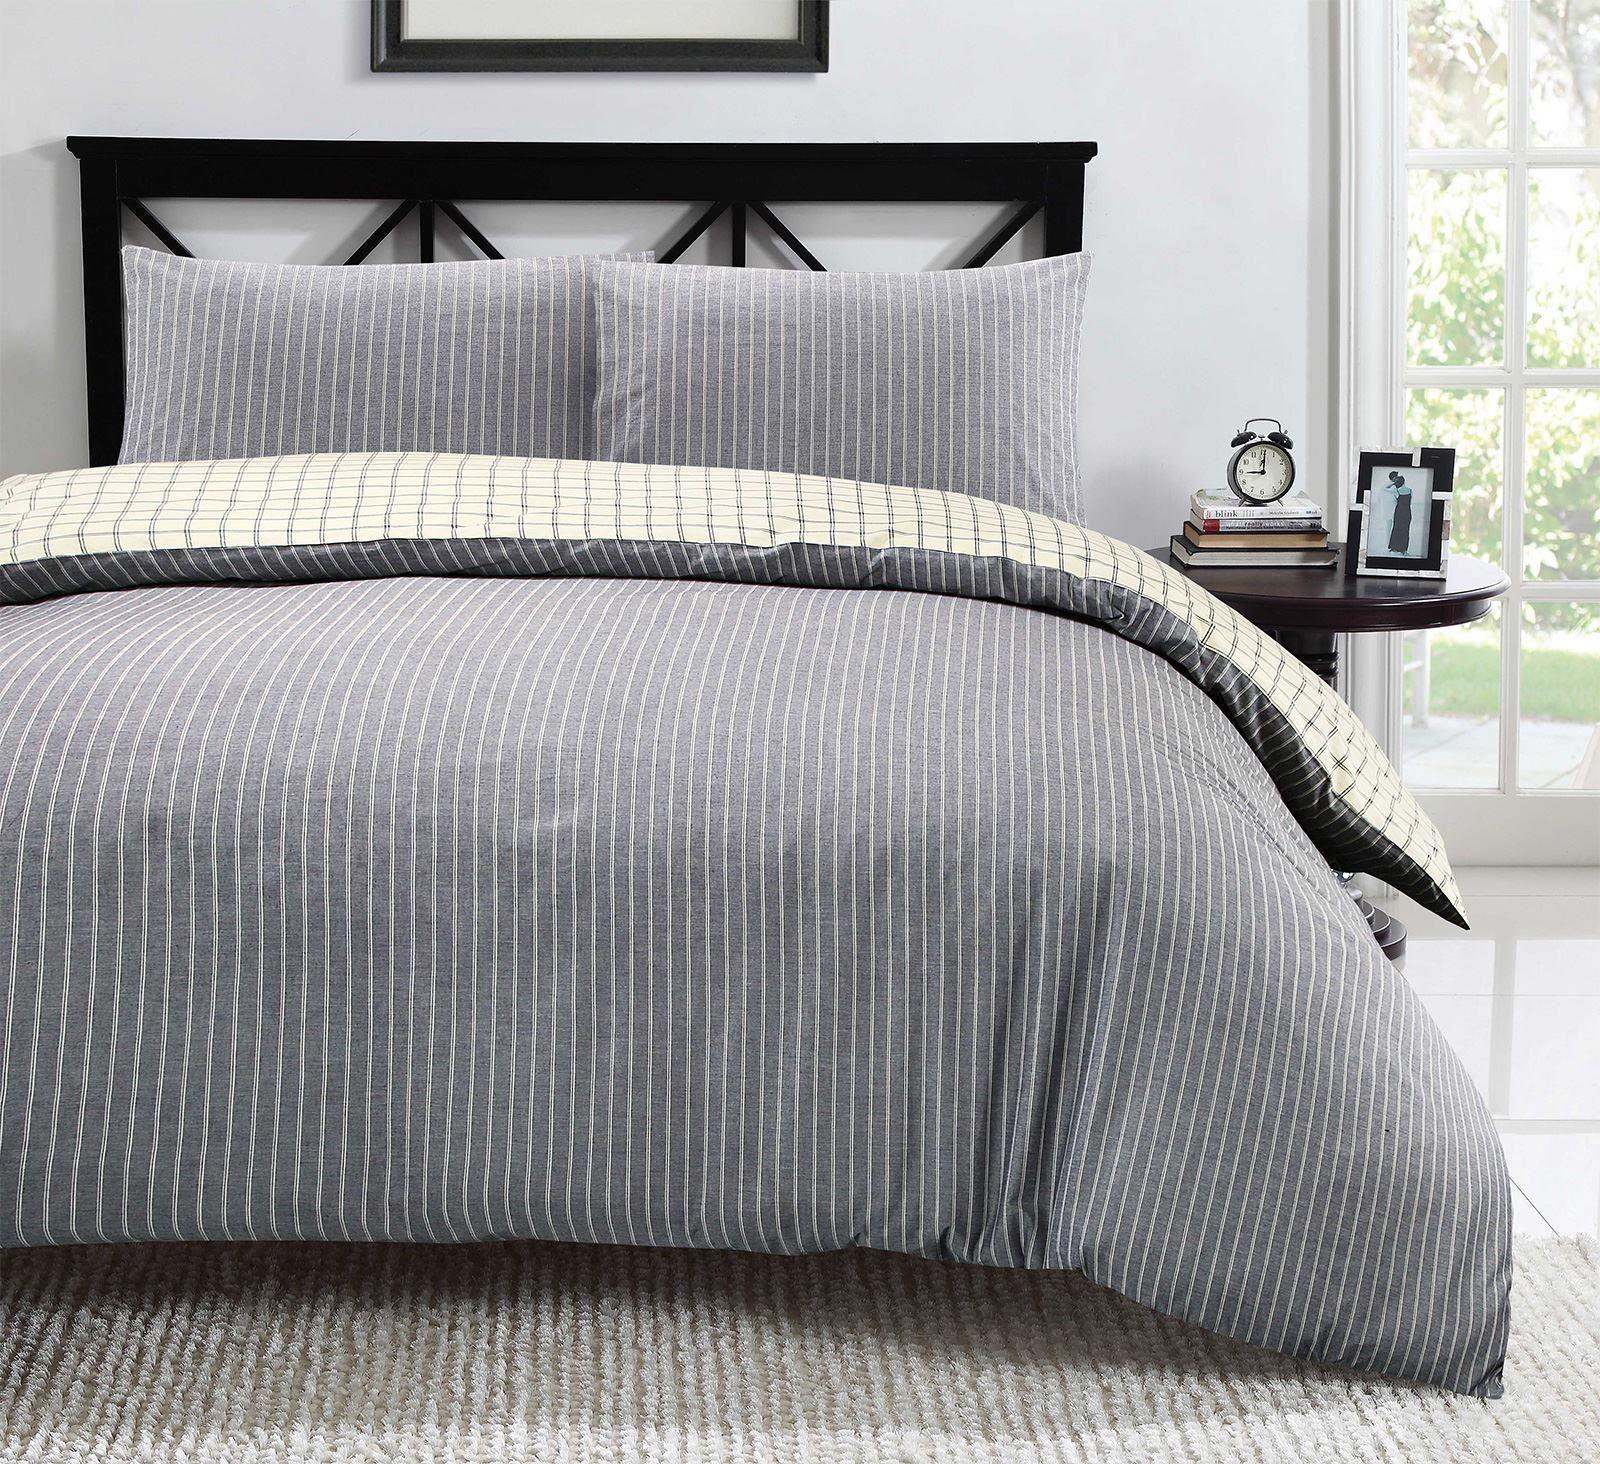 100-algodon-duvet-cover-set-raya-Cuadros-Reversible-Ropa-De-Cama-Individual-Doble-King miniatura 9